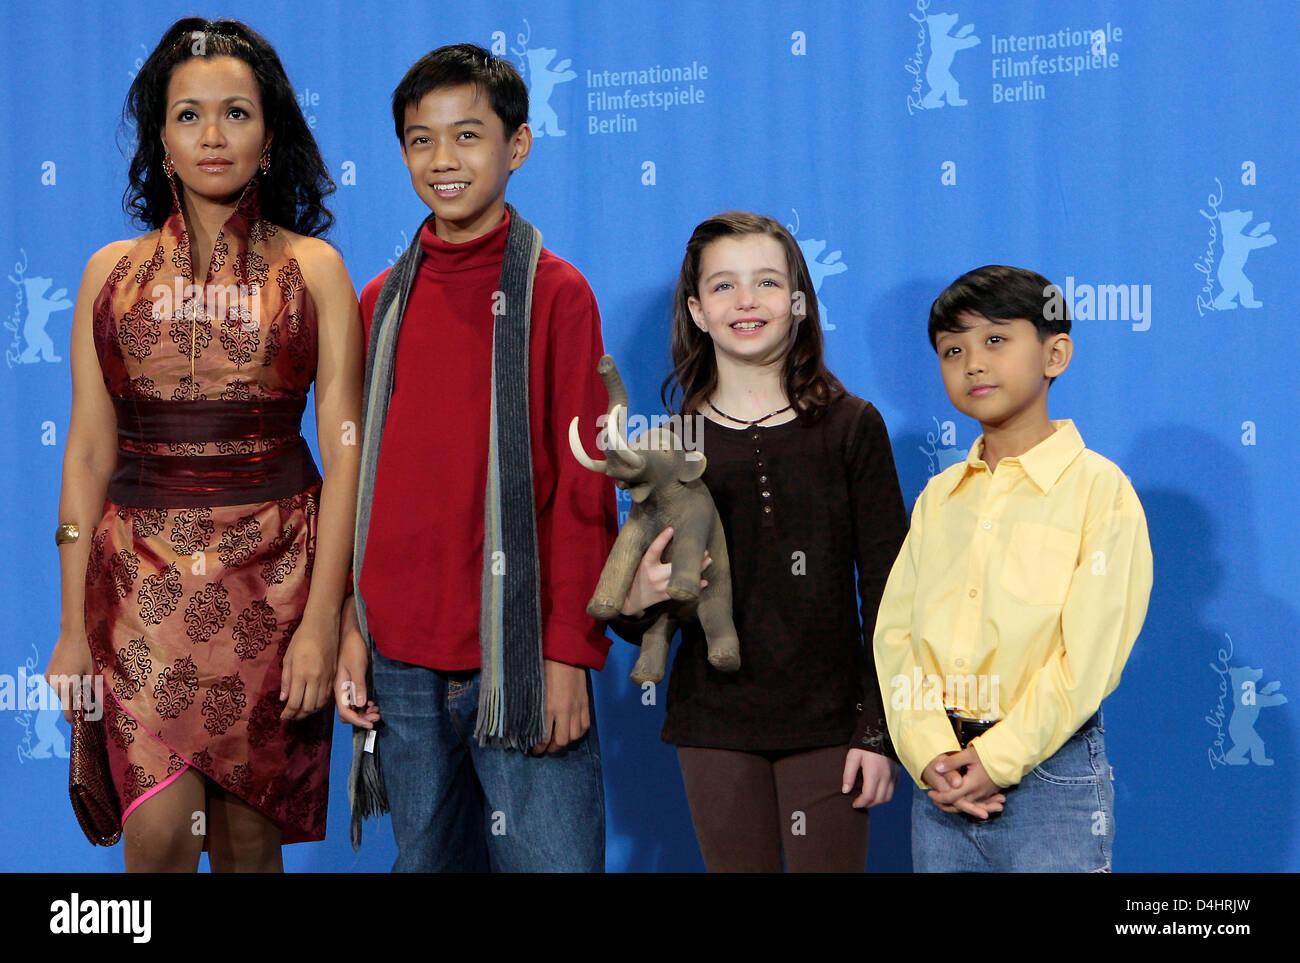 Madiha Iftikhar,Mikalah Gordon Adult clips Debi Mazar,Beverly Todd